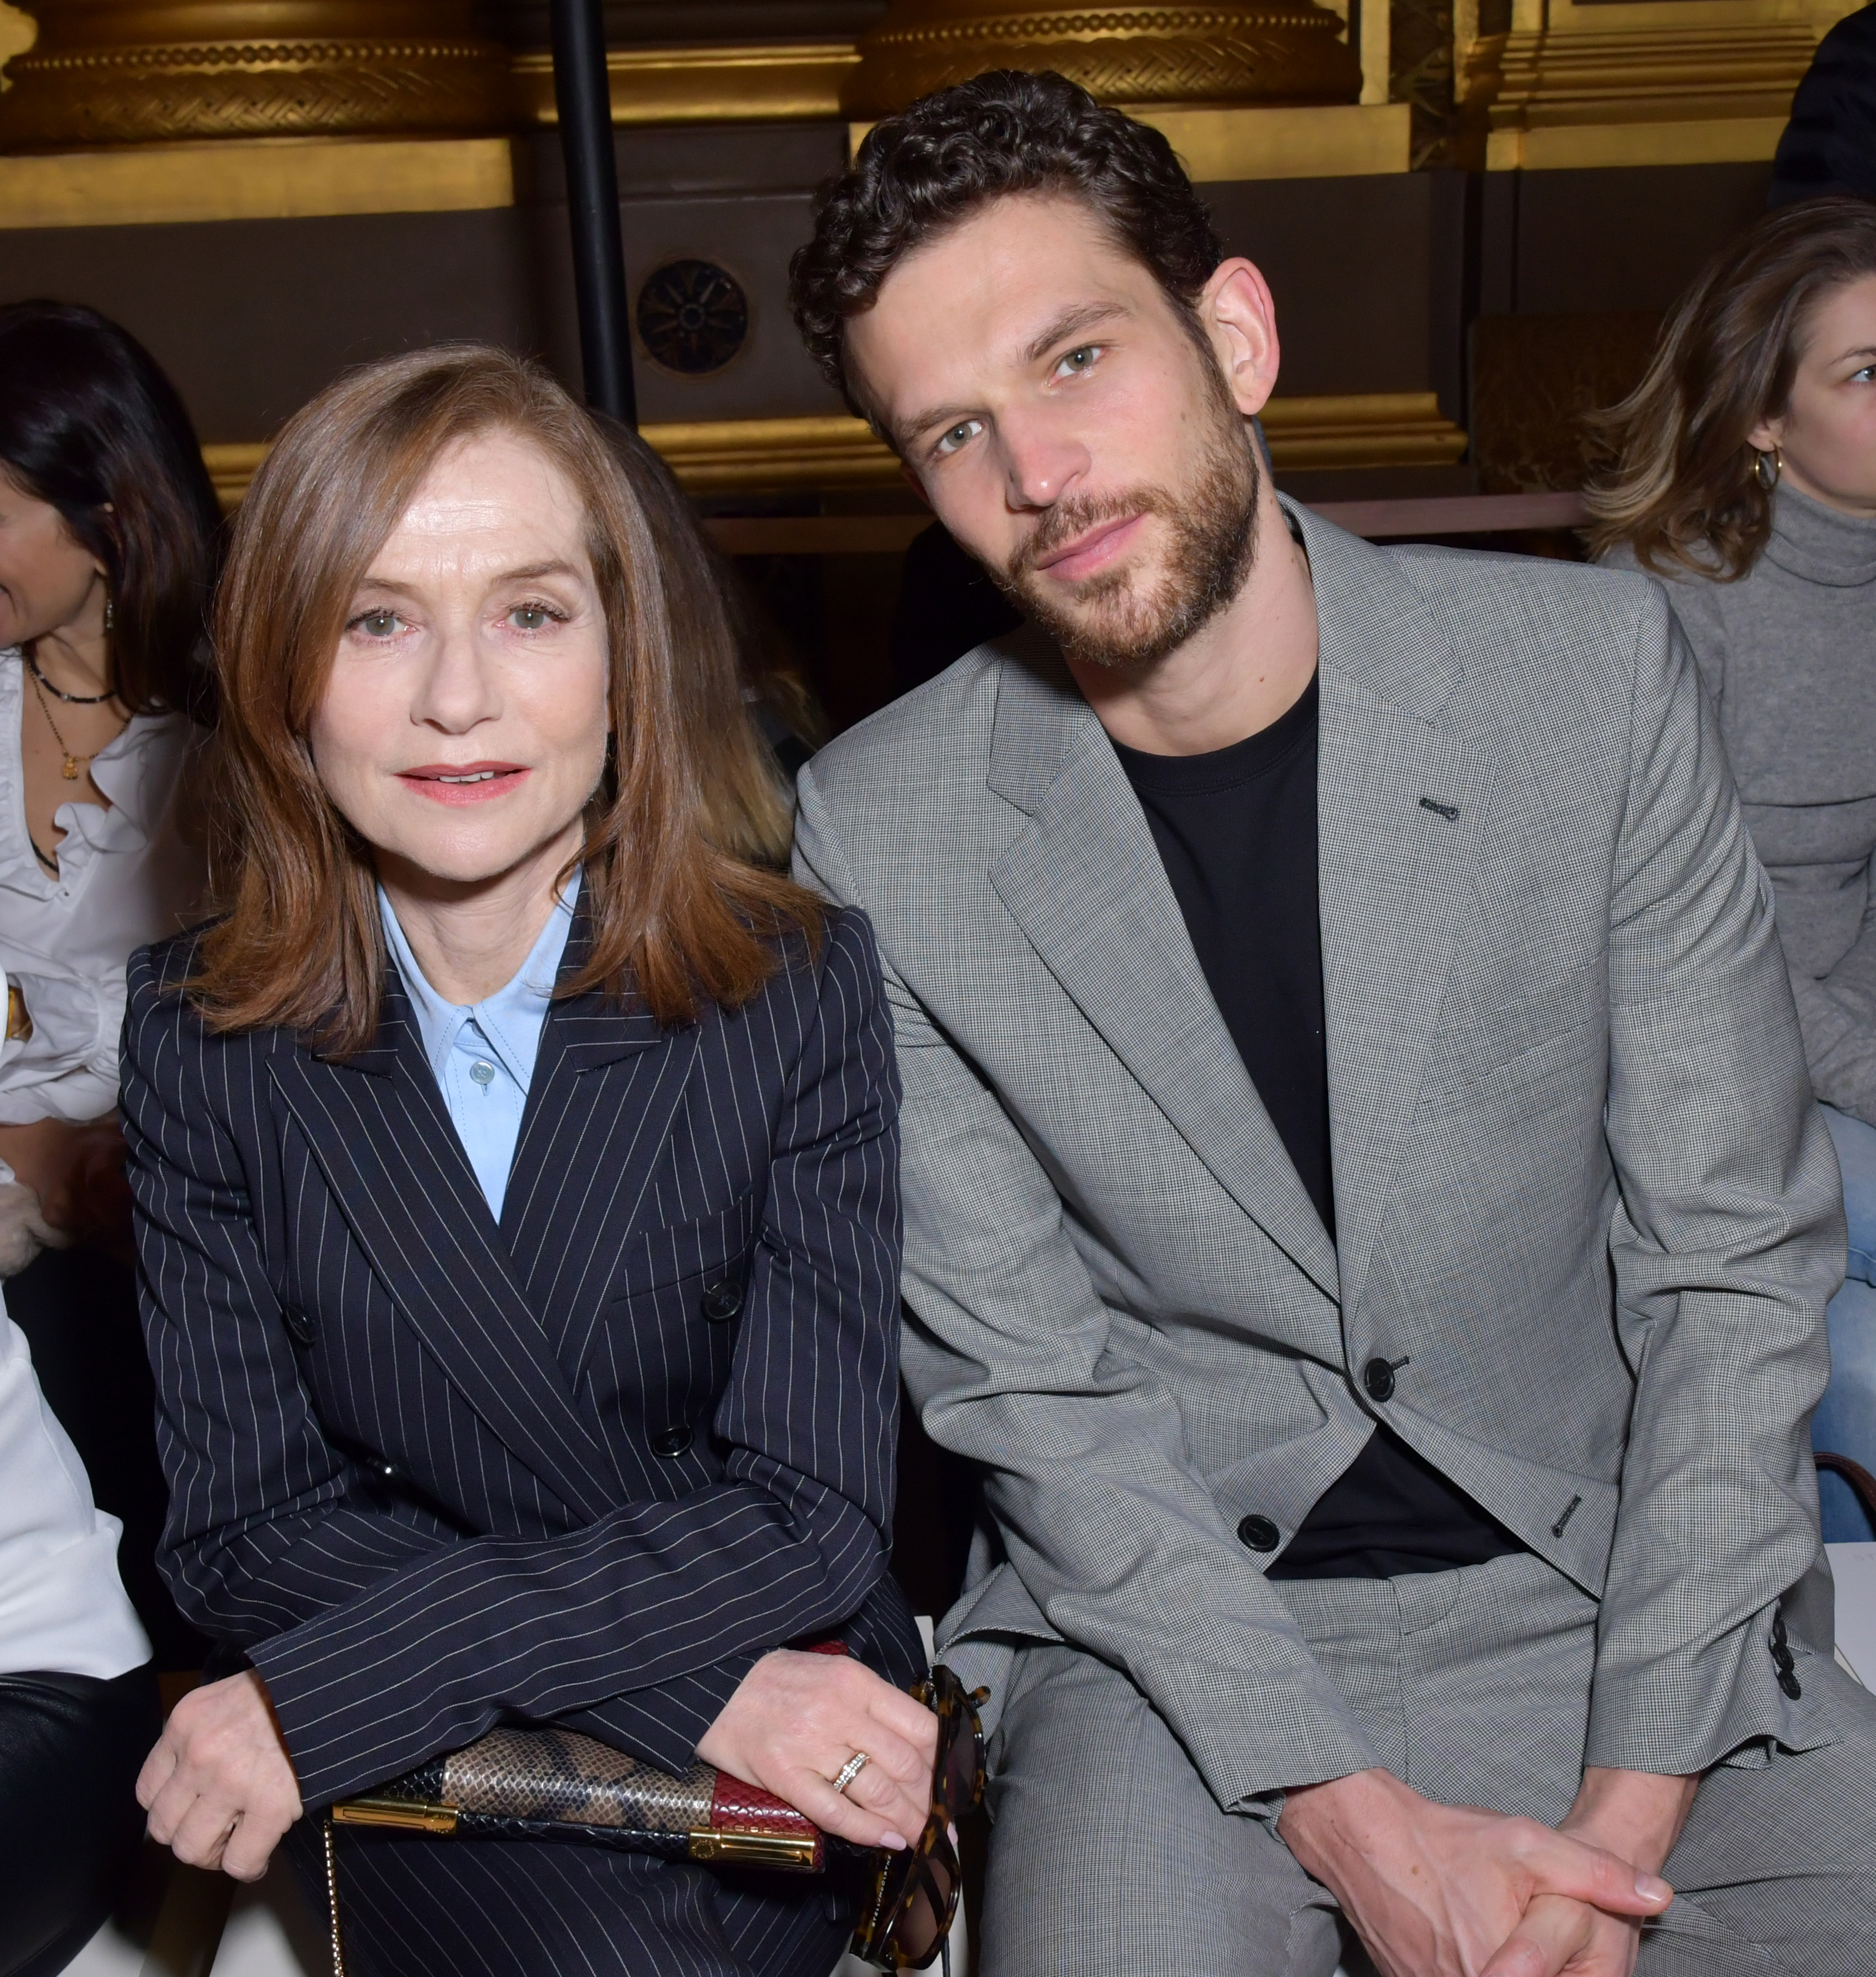 Isabelle Huppert and Arnaud Valois